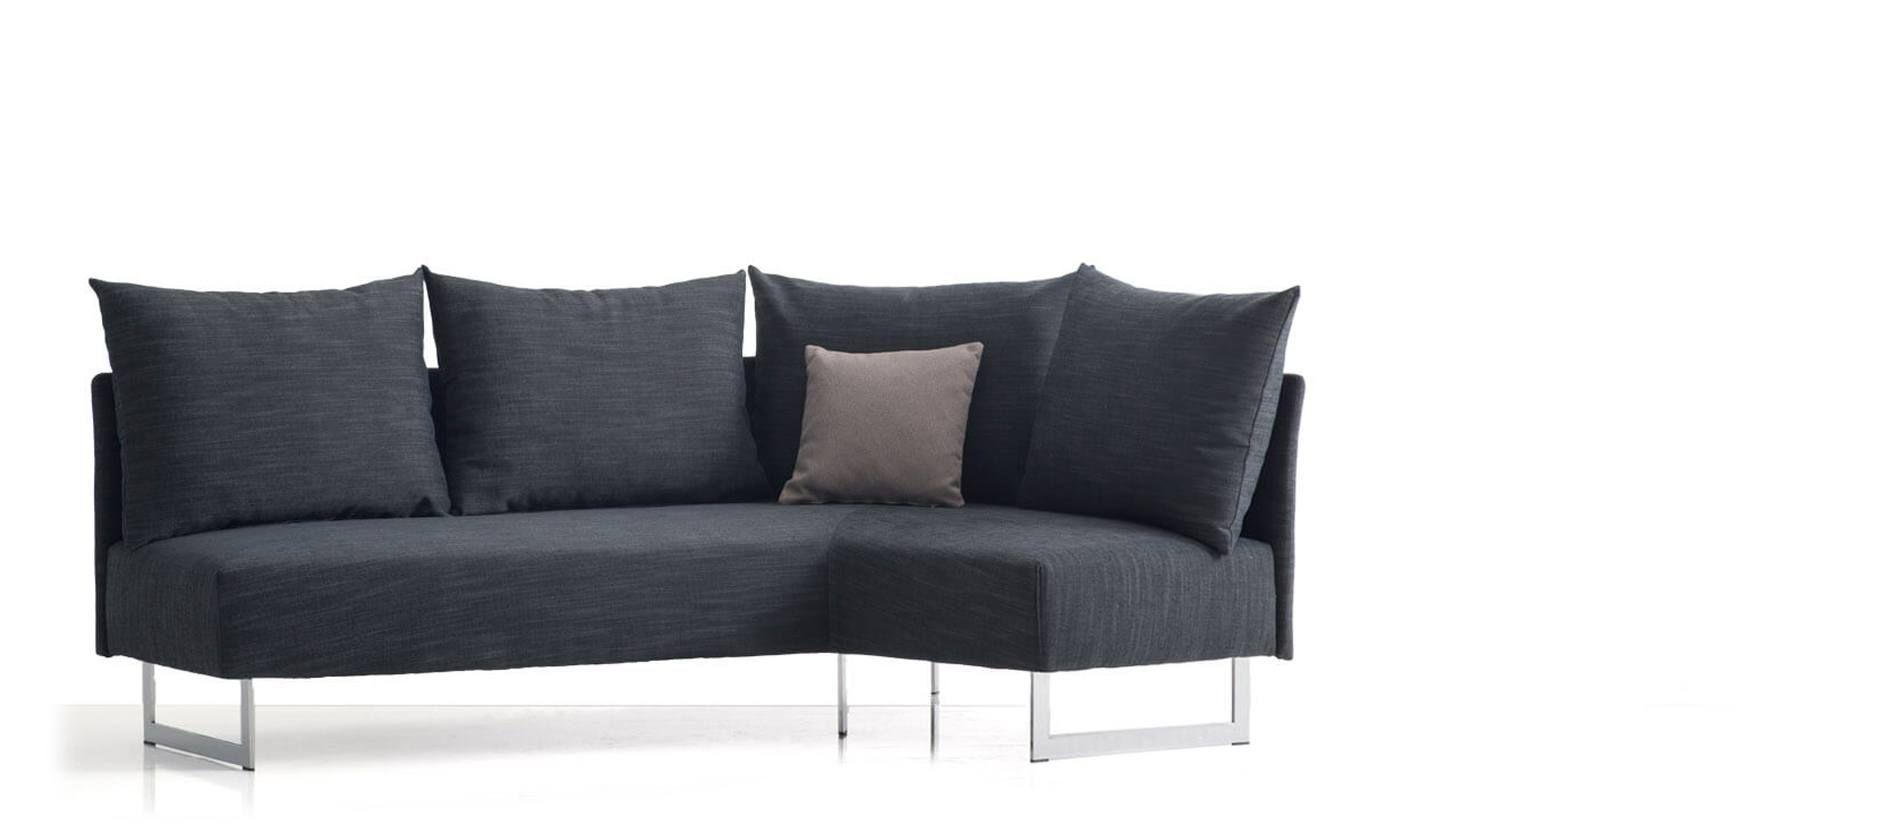 Full Size of Alcantara Sofa Helles Reinigen Sofascore Cleaning Speckiges Leder Lassen Couch Dampfreiniger Exklusive Mbel Gebraucht Elegant In L Form Echtleder Xora Günstig Sofa Alcantara Sofa